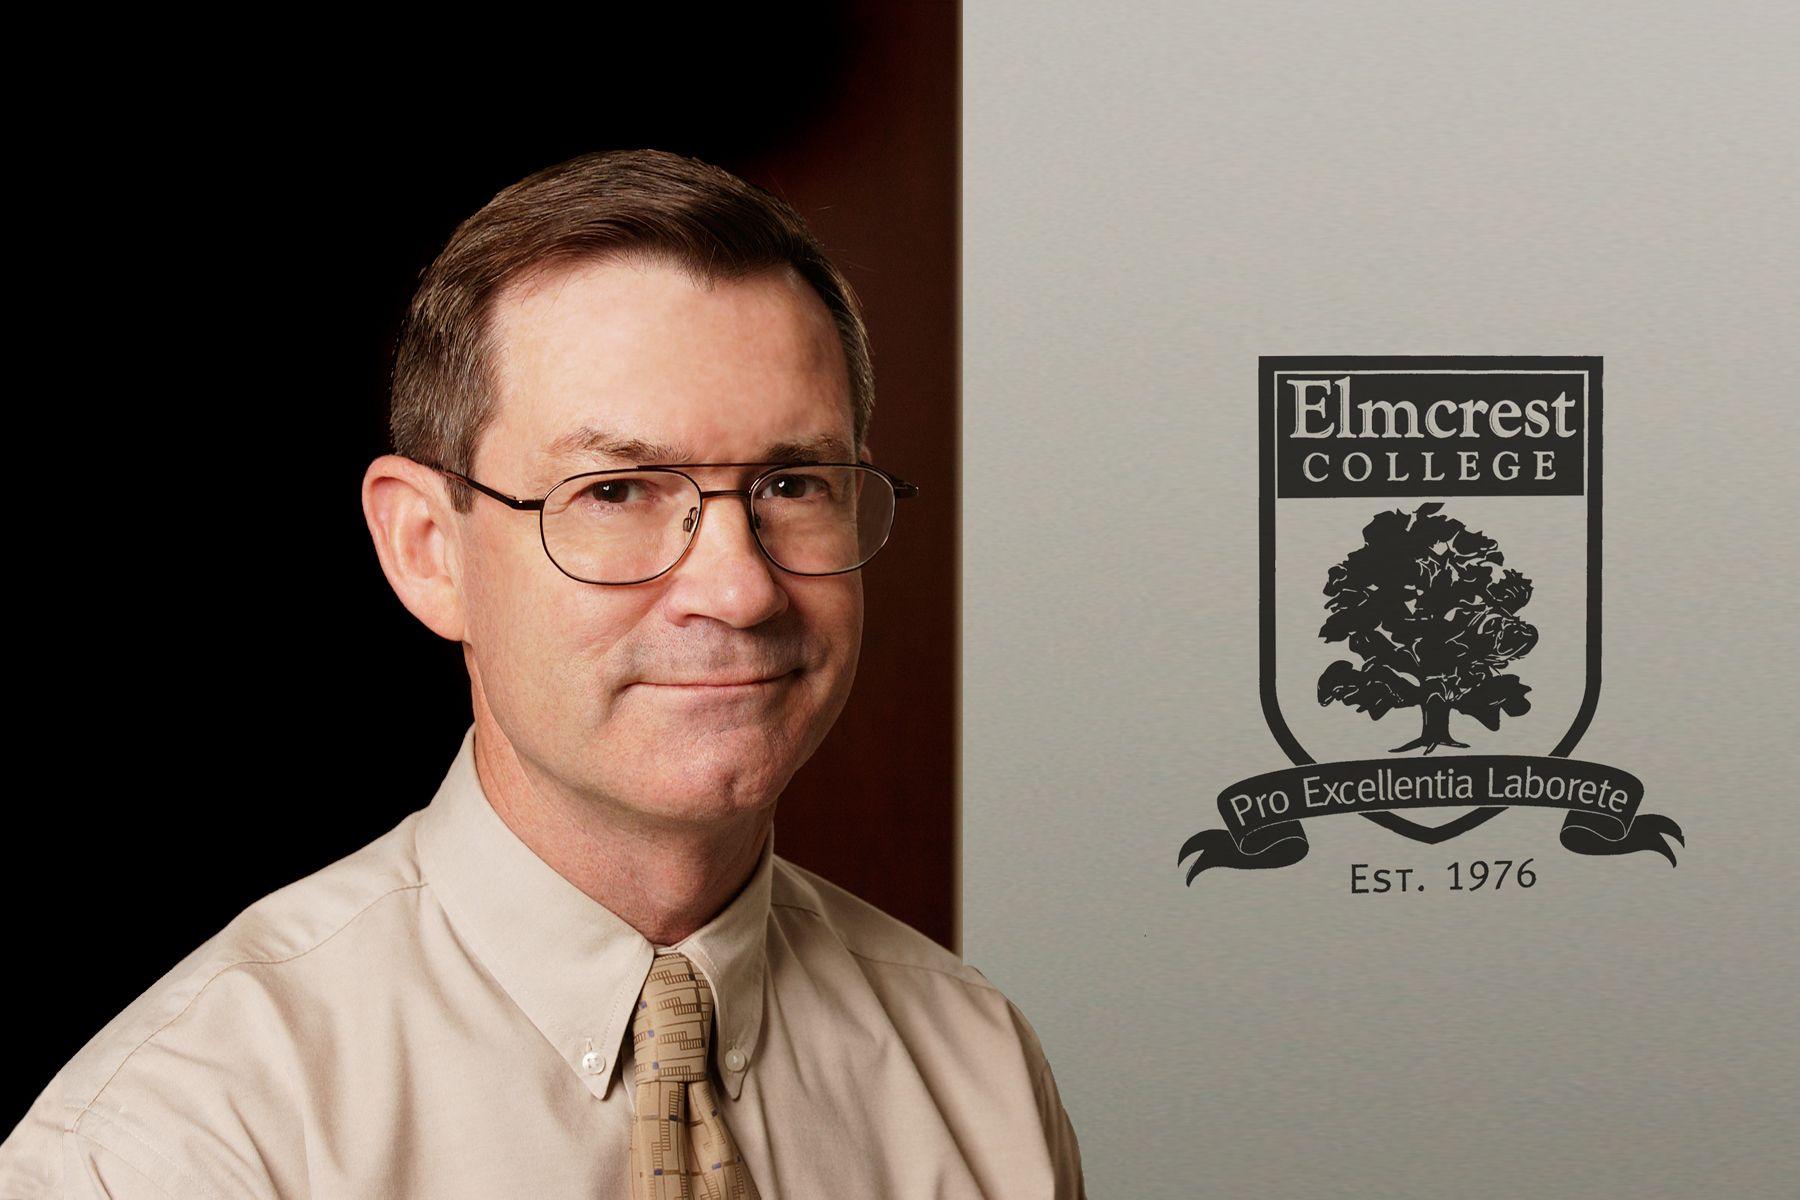 Elmcrest College Toronto ON